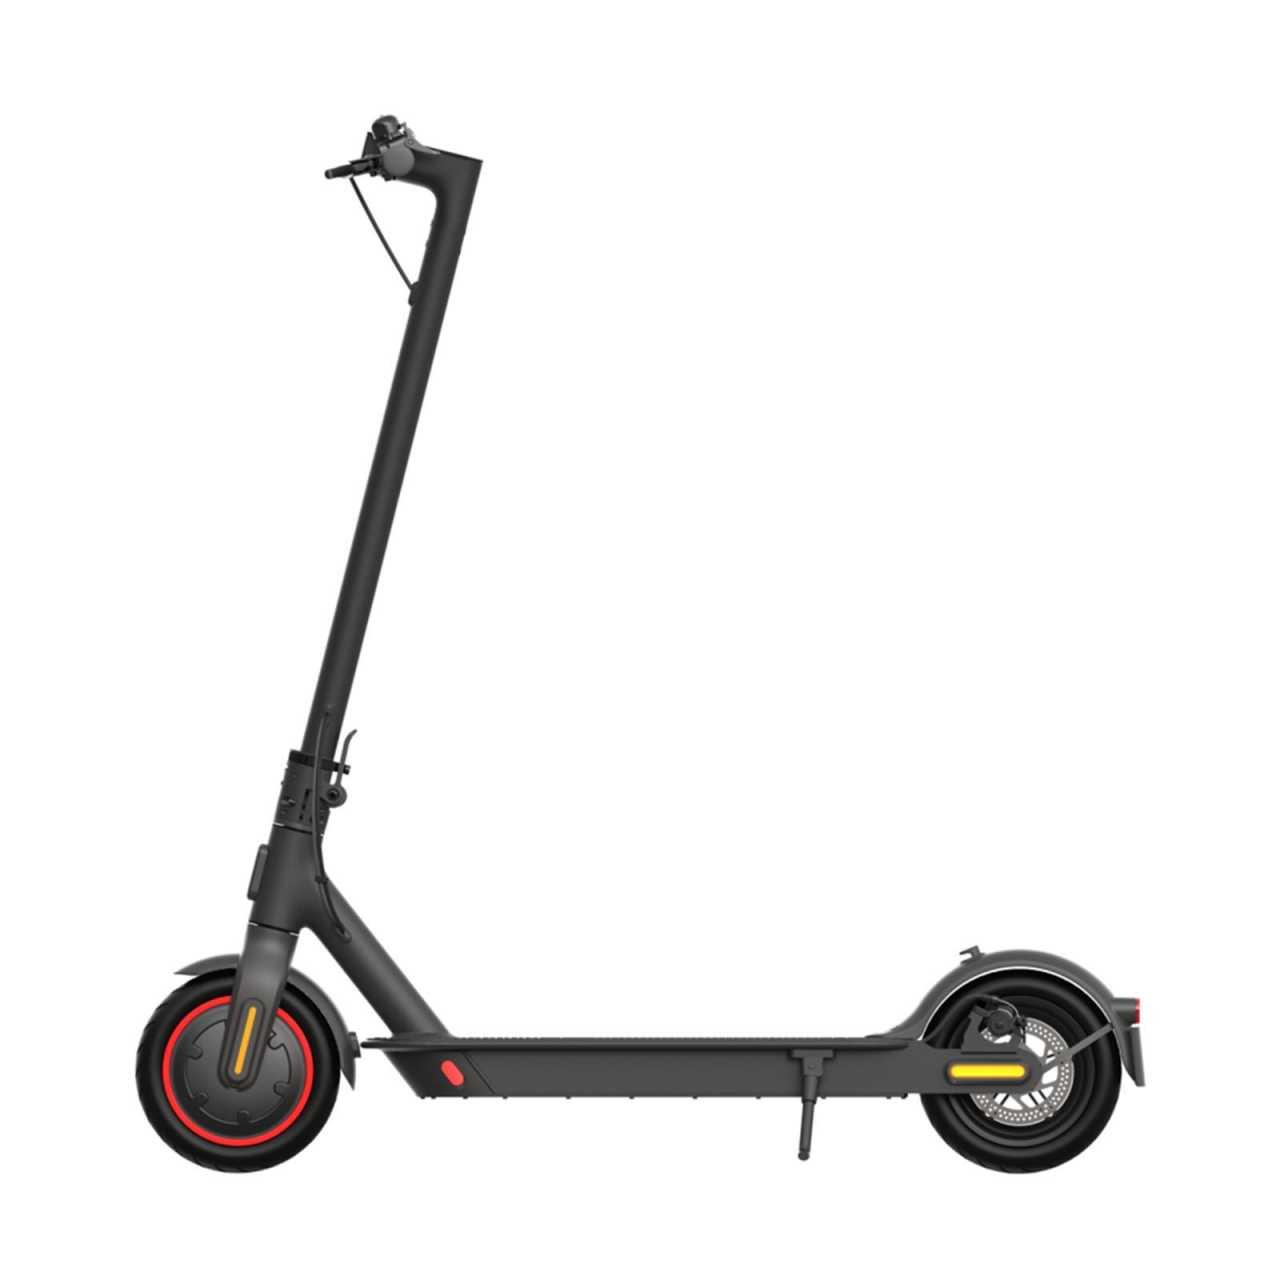 Xiaomi Mi Electric Scooter Pro 2 Luftreifen 8.5 Zoll, max. 25 km/h, EU Modell keine Straßenzulassung FRESCO015